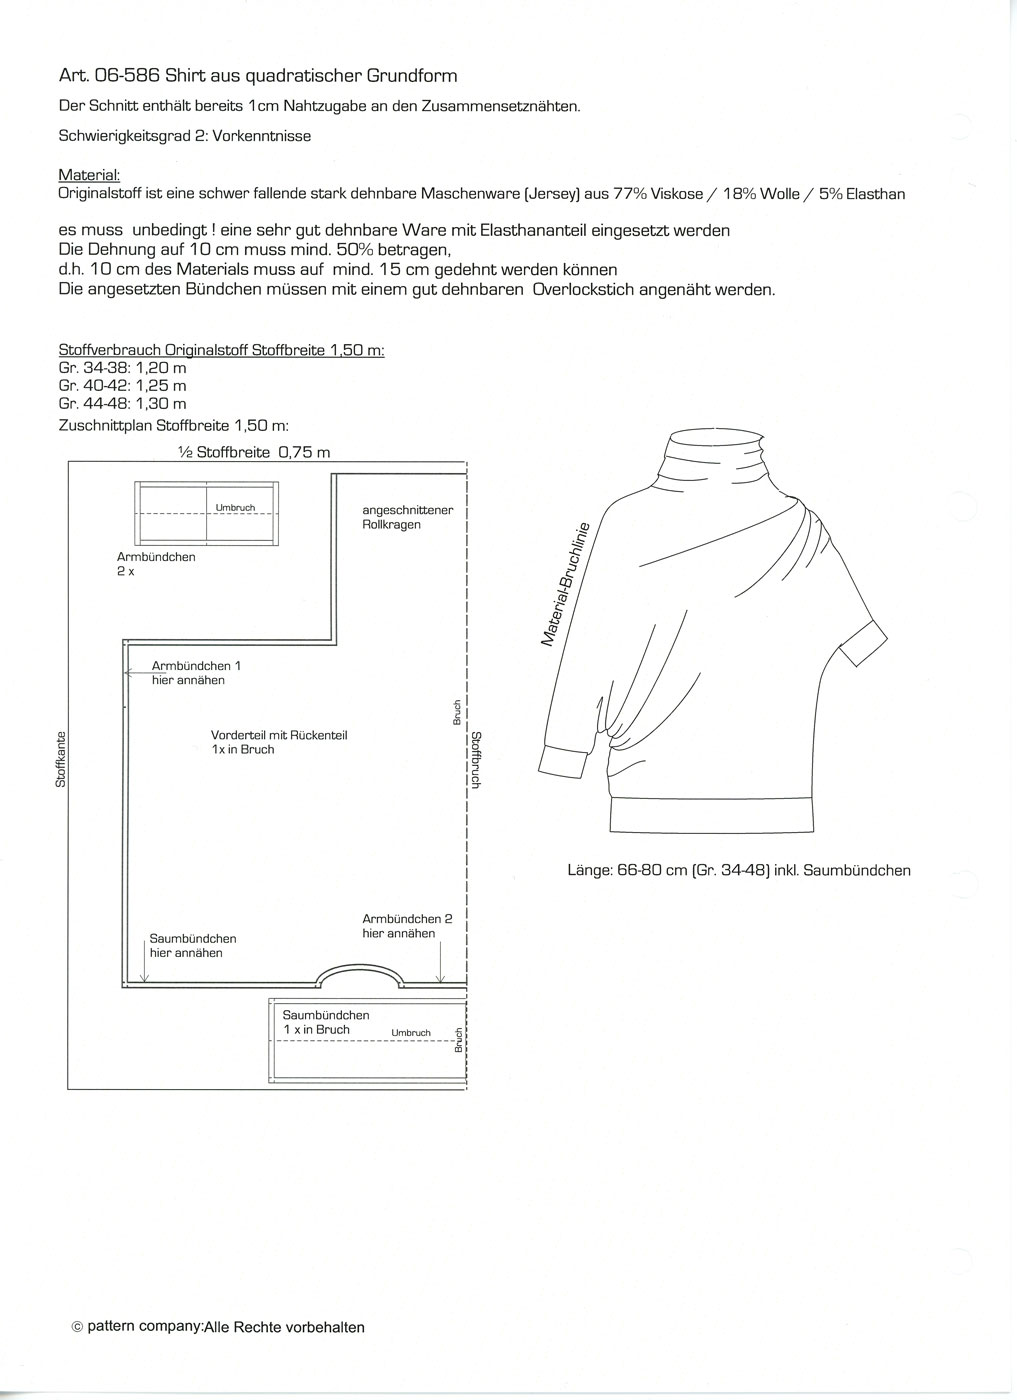 Schnittmuster - Shirt - 06-586 - Pattern Company